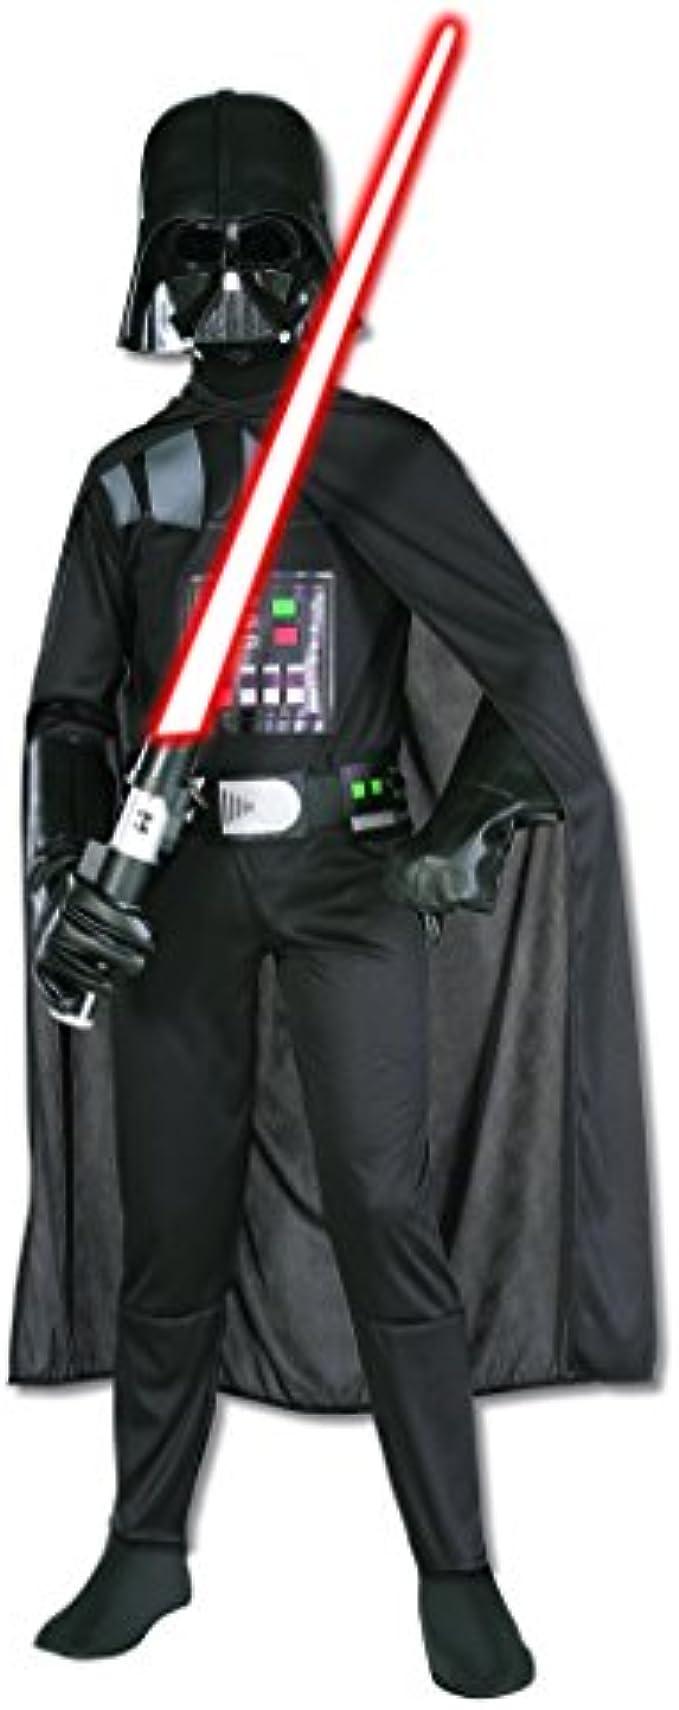 Star Wars Child's Darth Vader Costume